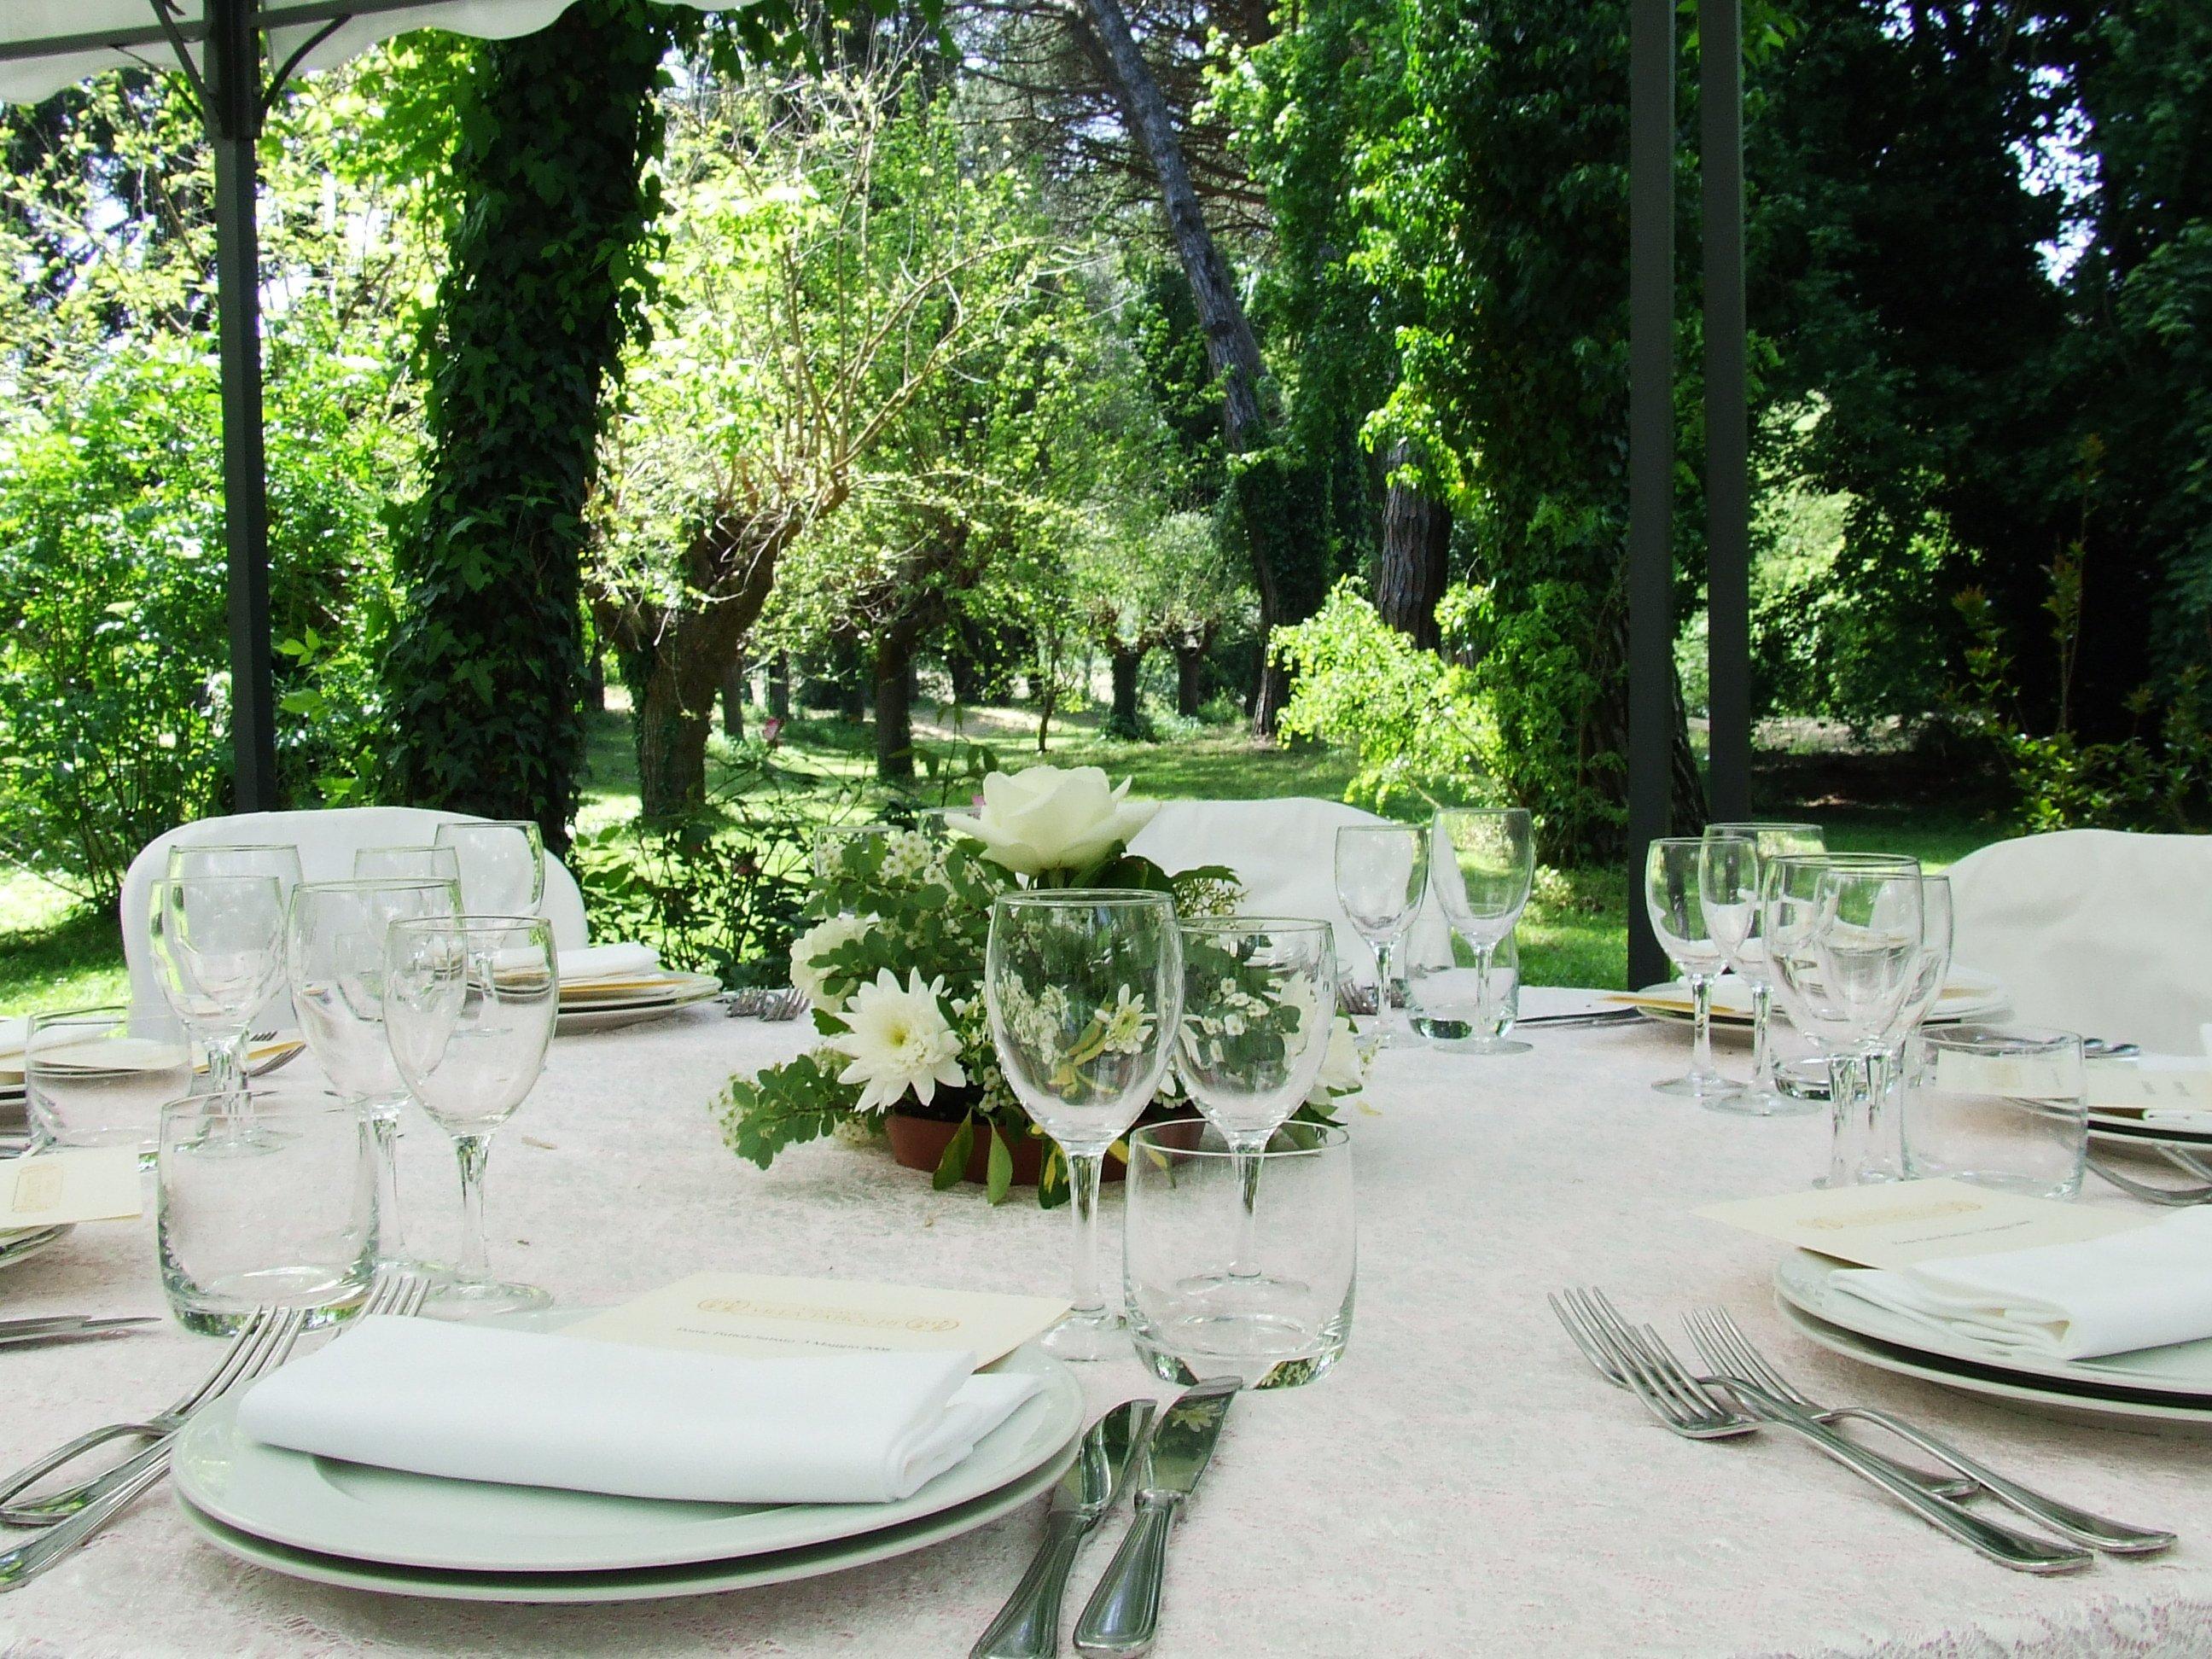 Matrimonio Country Chic Veneto : Matrimonio country chic a villa taticchi umbria online